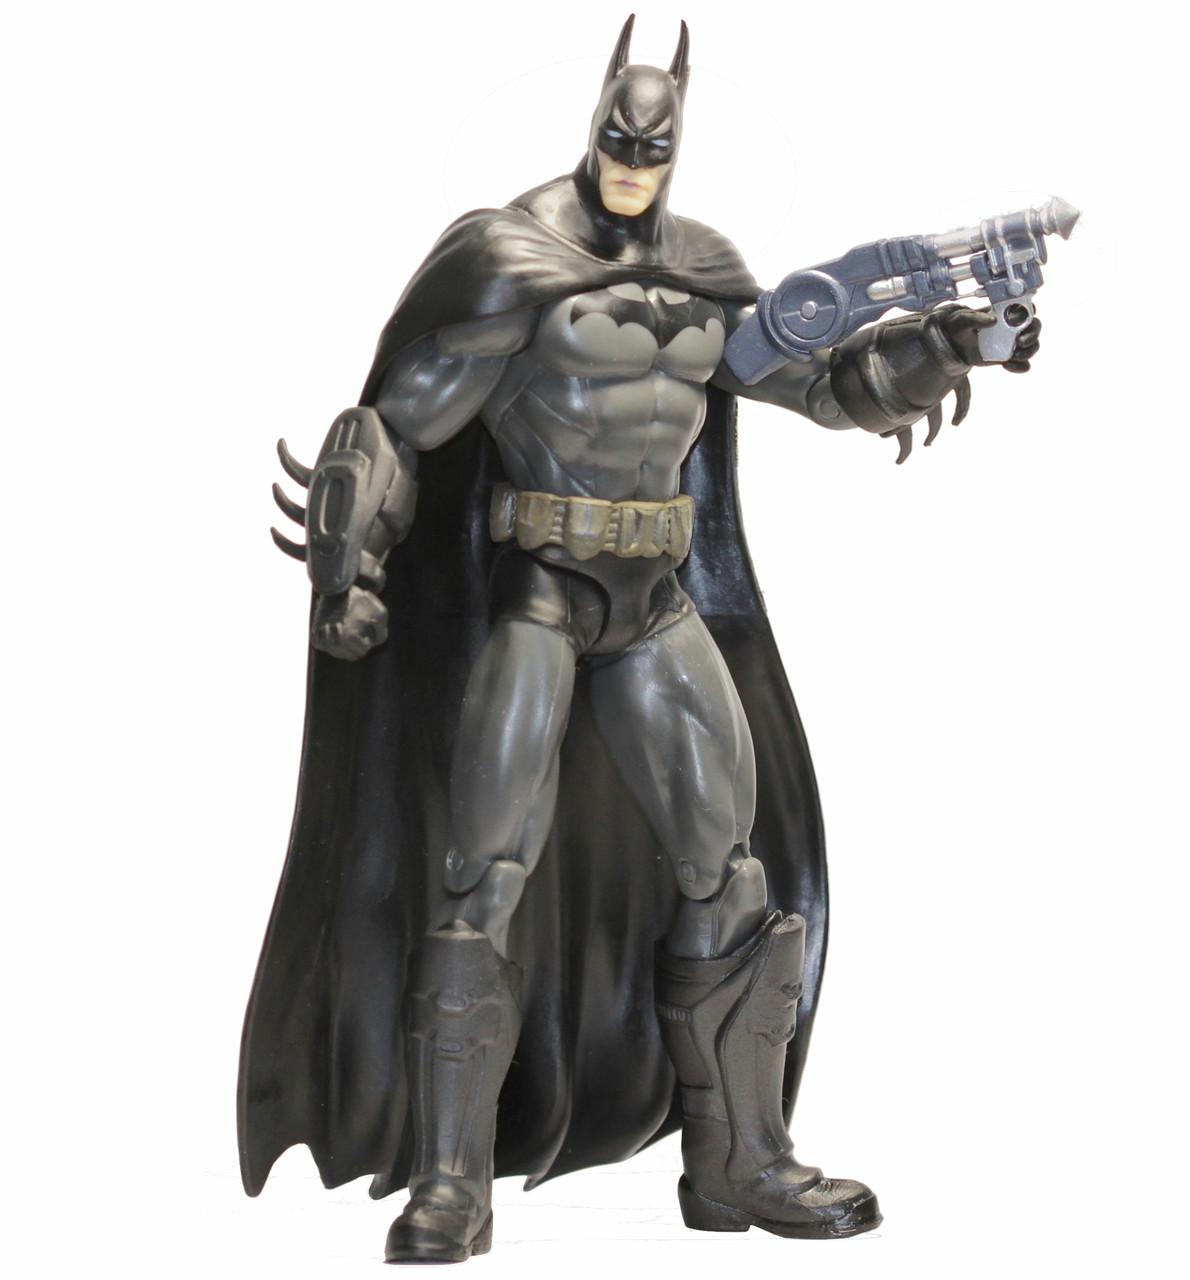 Фигурка DC Comics Бэтмен, Аркхэм Сити, 17 см - Batman, Arkham City